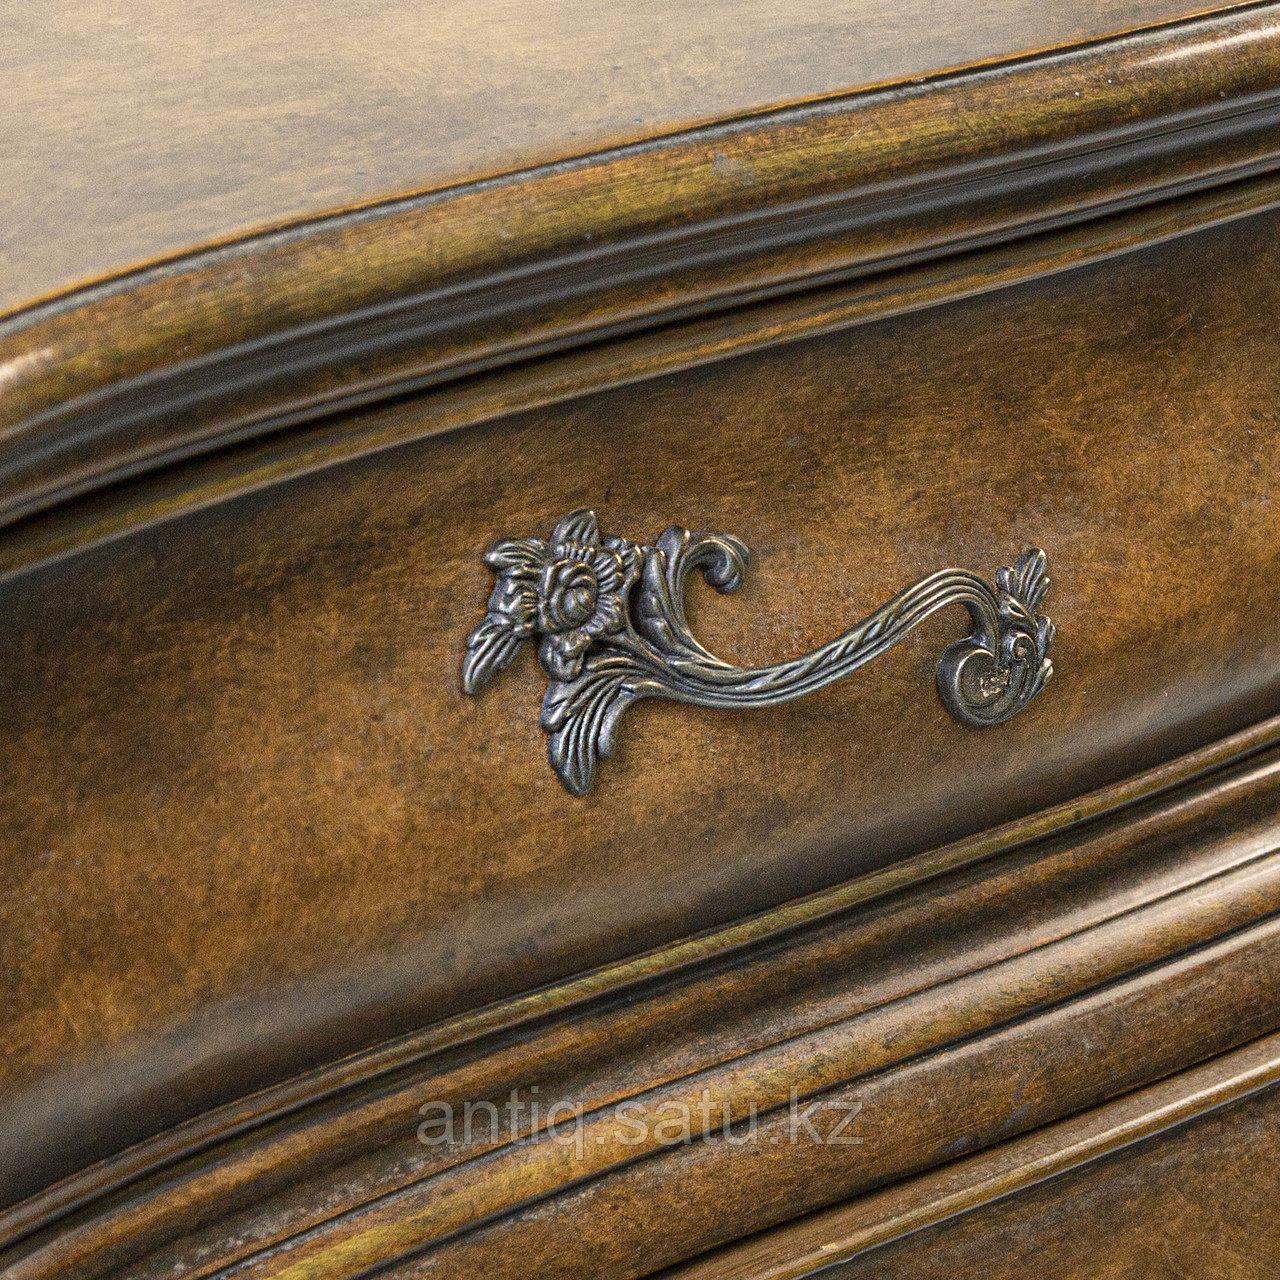 Комод в стиле Людовика XV Привезен из Голландии XX век. - фото 5